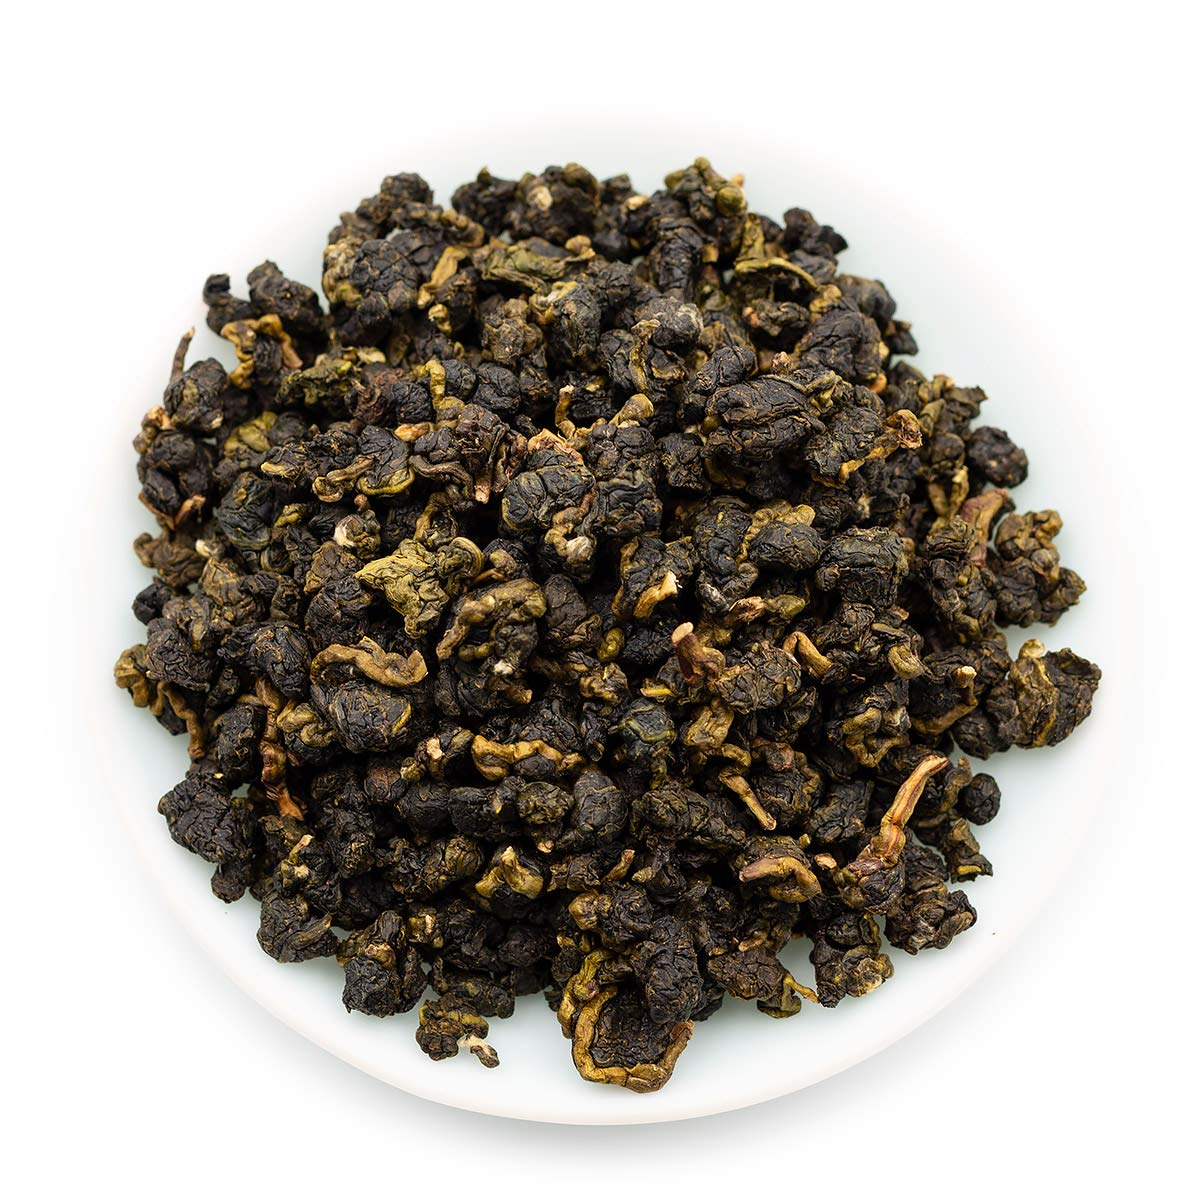 1kg Jin Xuan Milk Oolong Tea Leaves, Alishan High Mountain Tea Milk Oolong Green Tea Loose Leaf, Powerful Anti-Oxidants, High Elevation Grown, Help Weight Loss